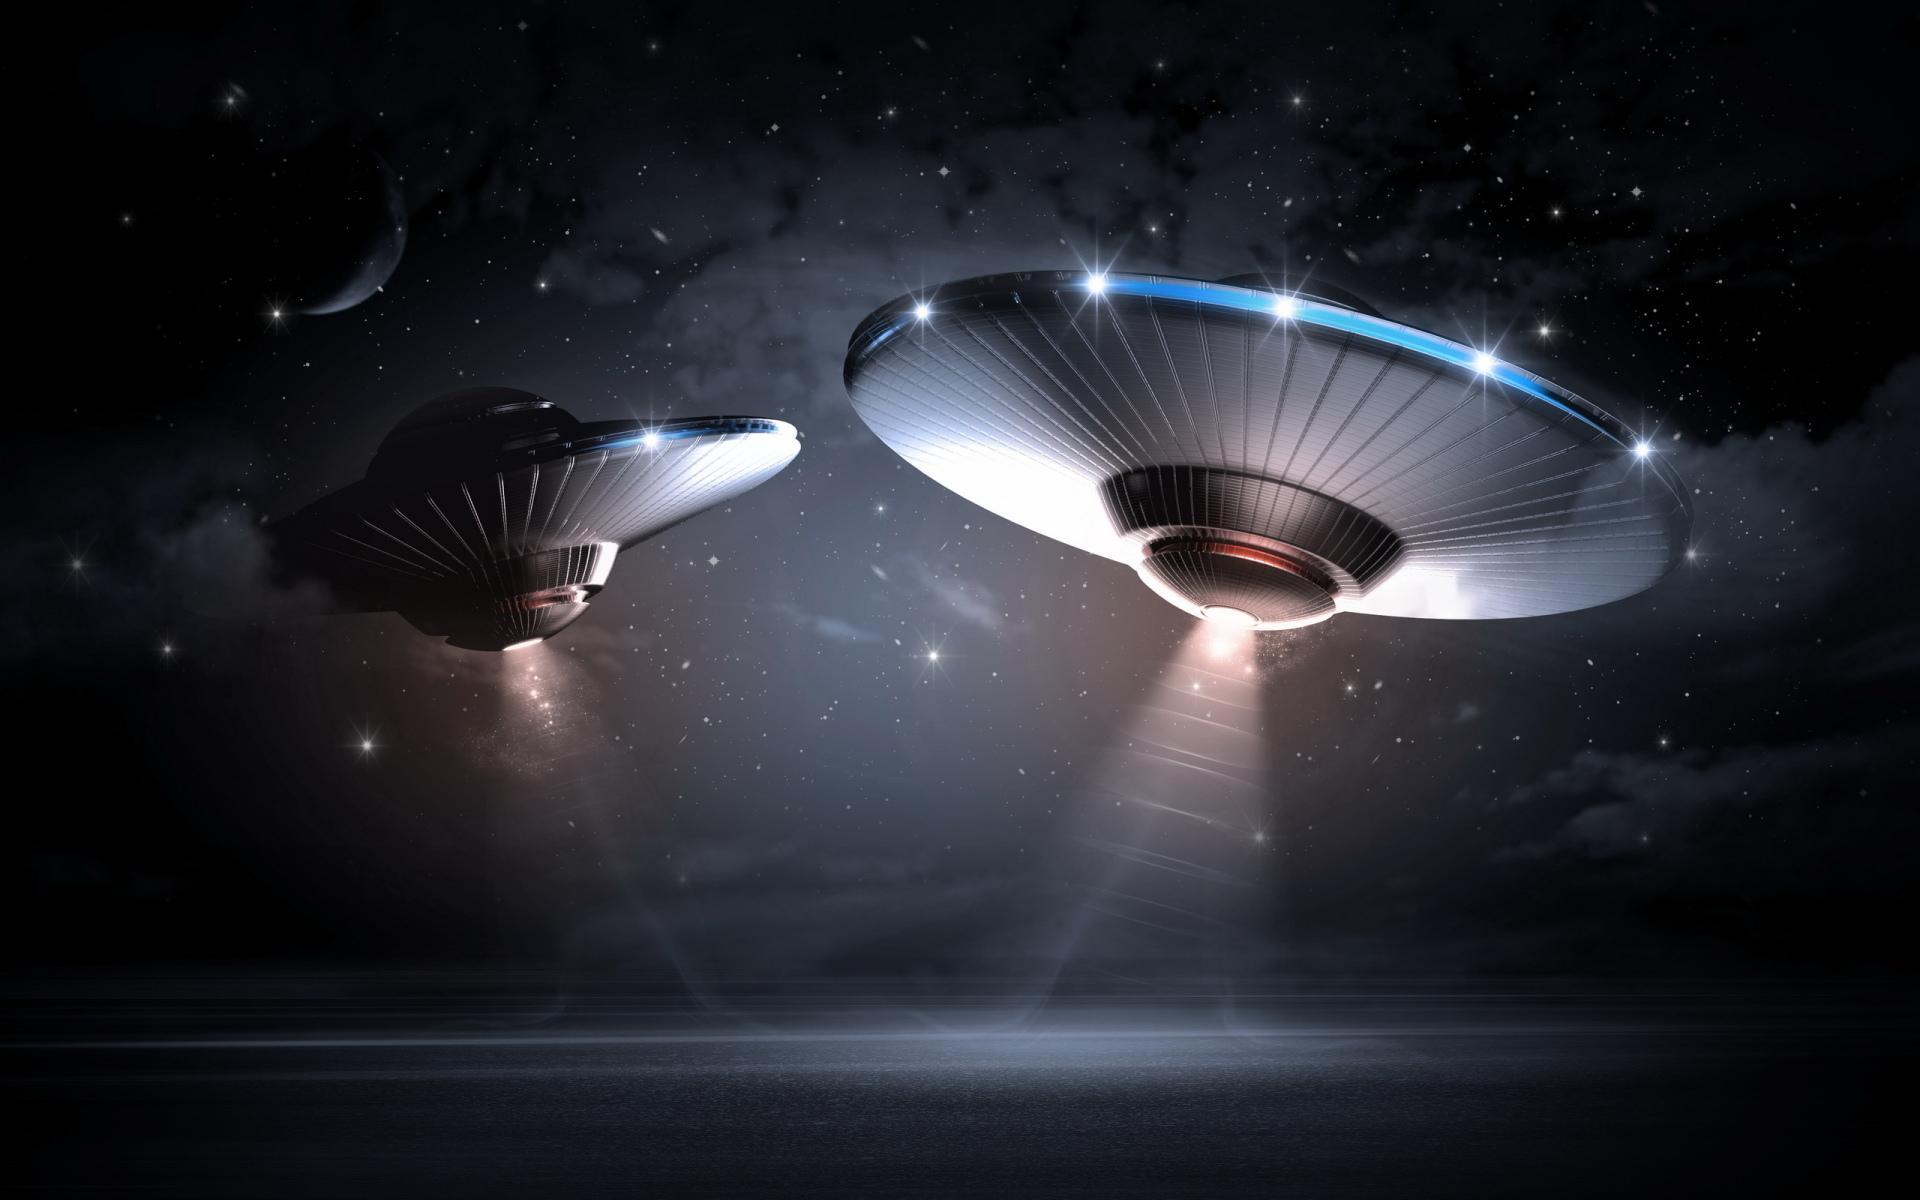 Ufo Sci Fi wallpapers HD quality